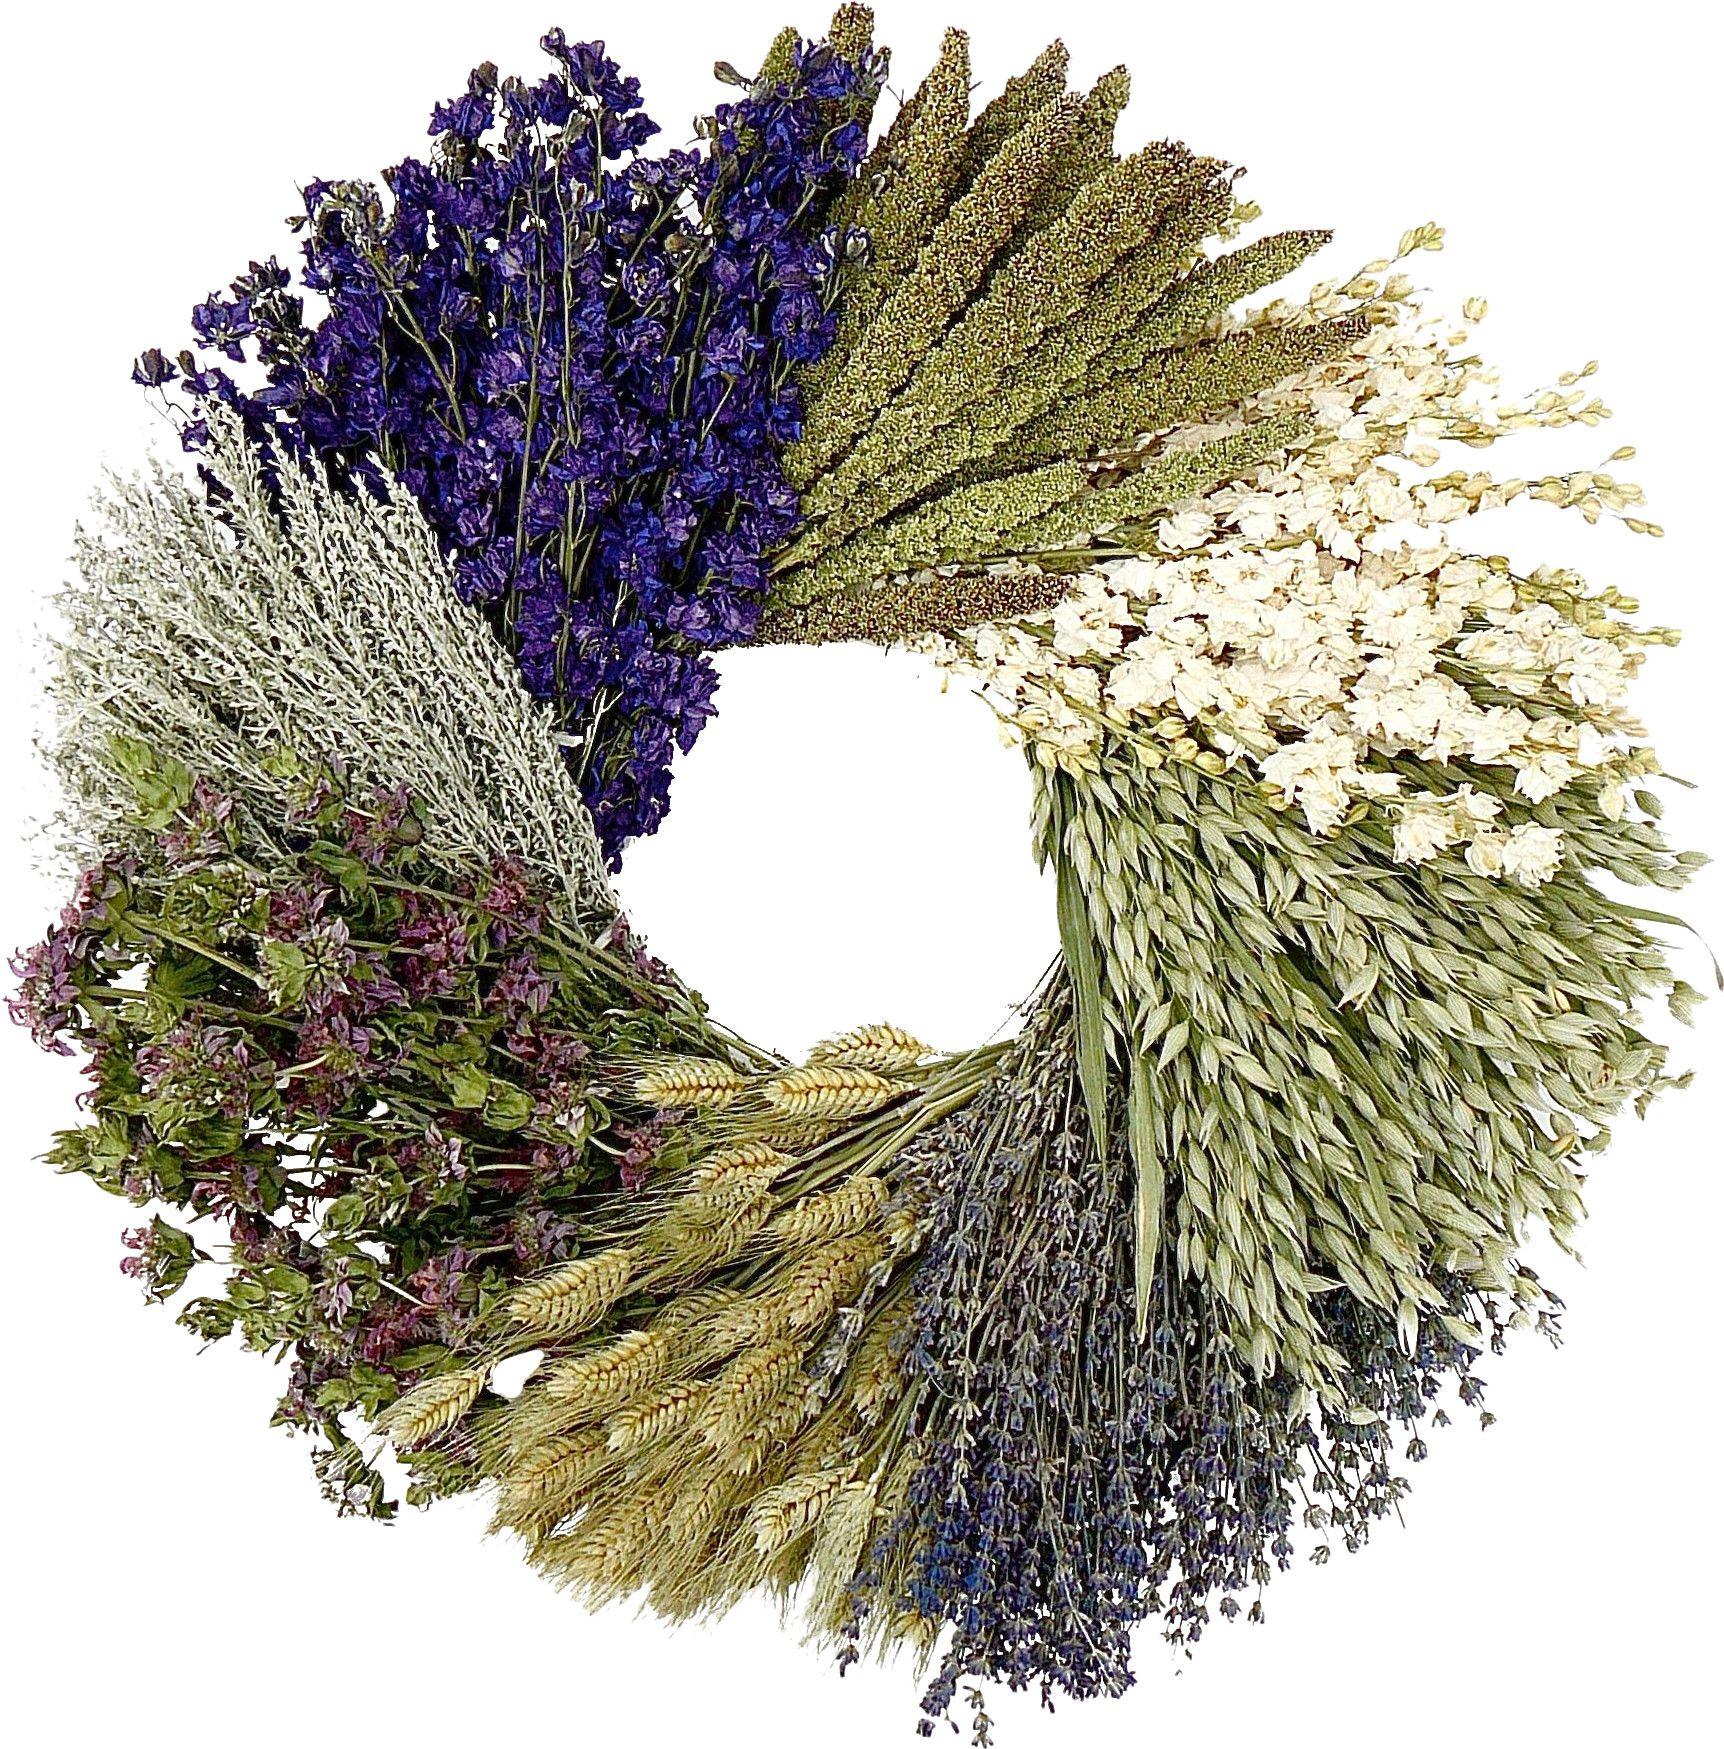 Preserved Lakspur, Millet, Wheat, & Lavender Wreath